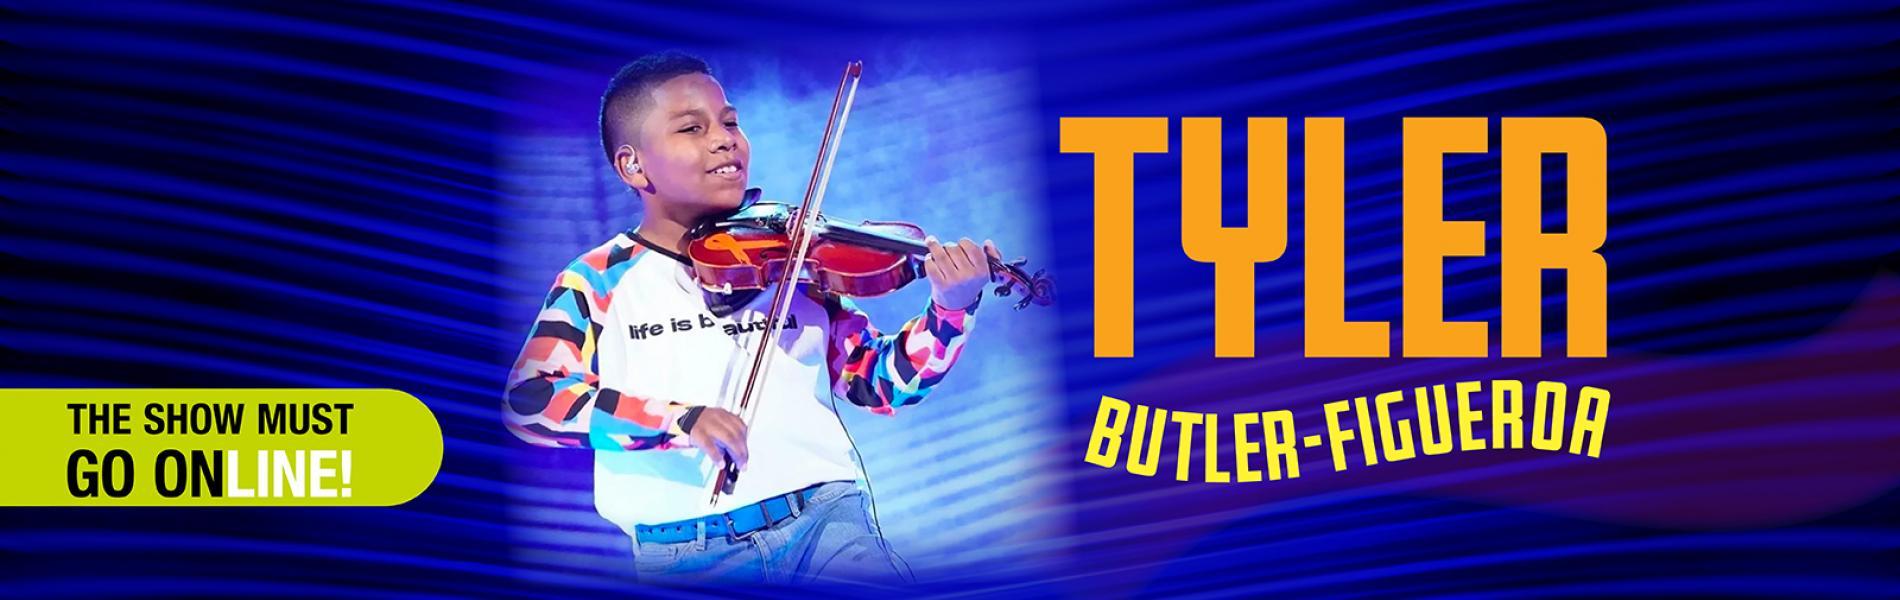 Tyler Butler-Figueroa